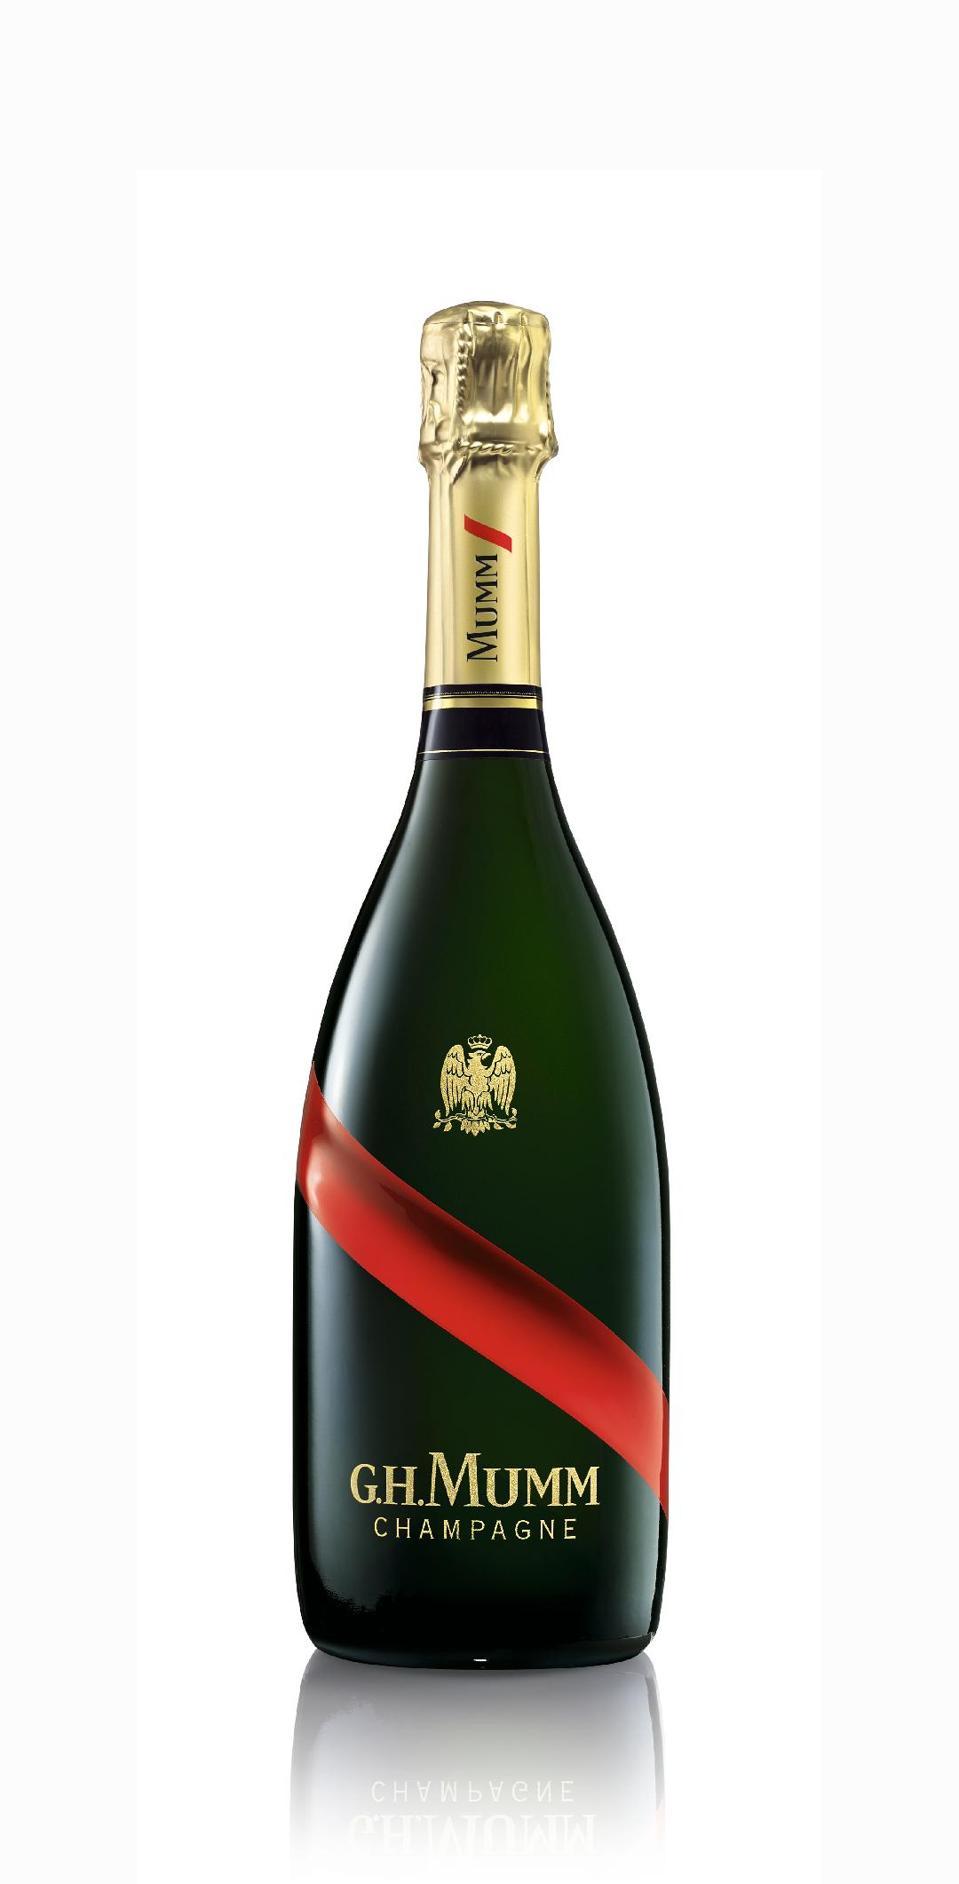 A bottle of G.H. Mumm Champagne